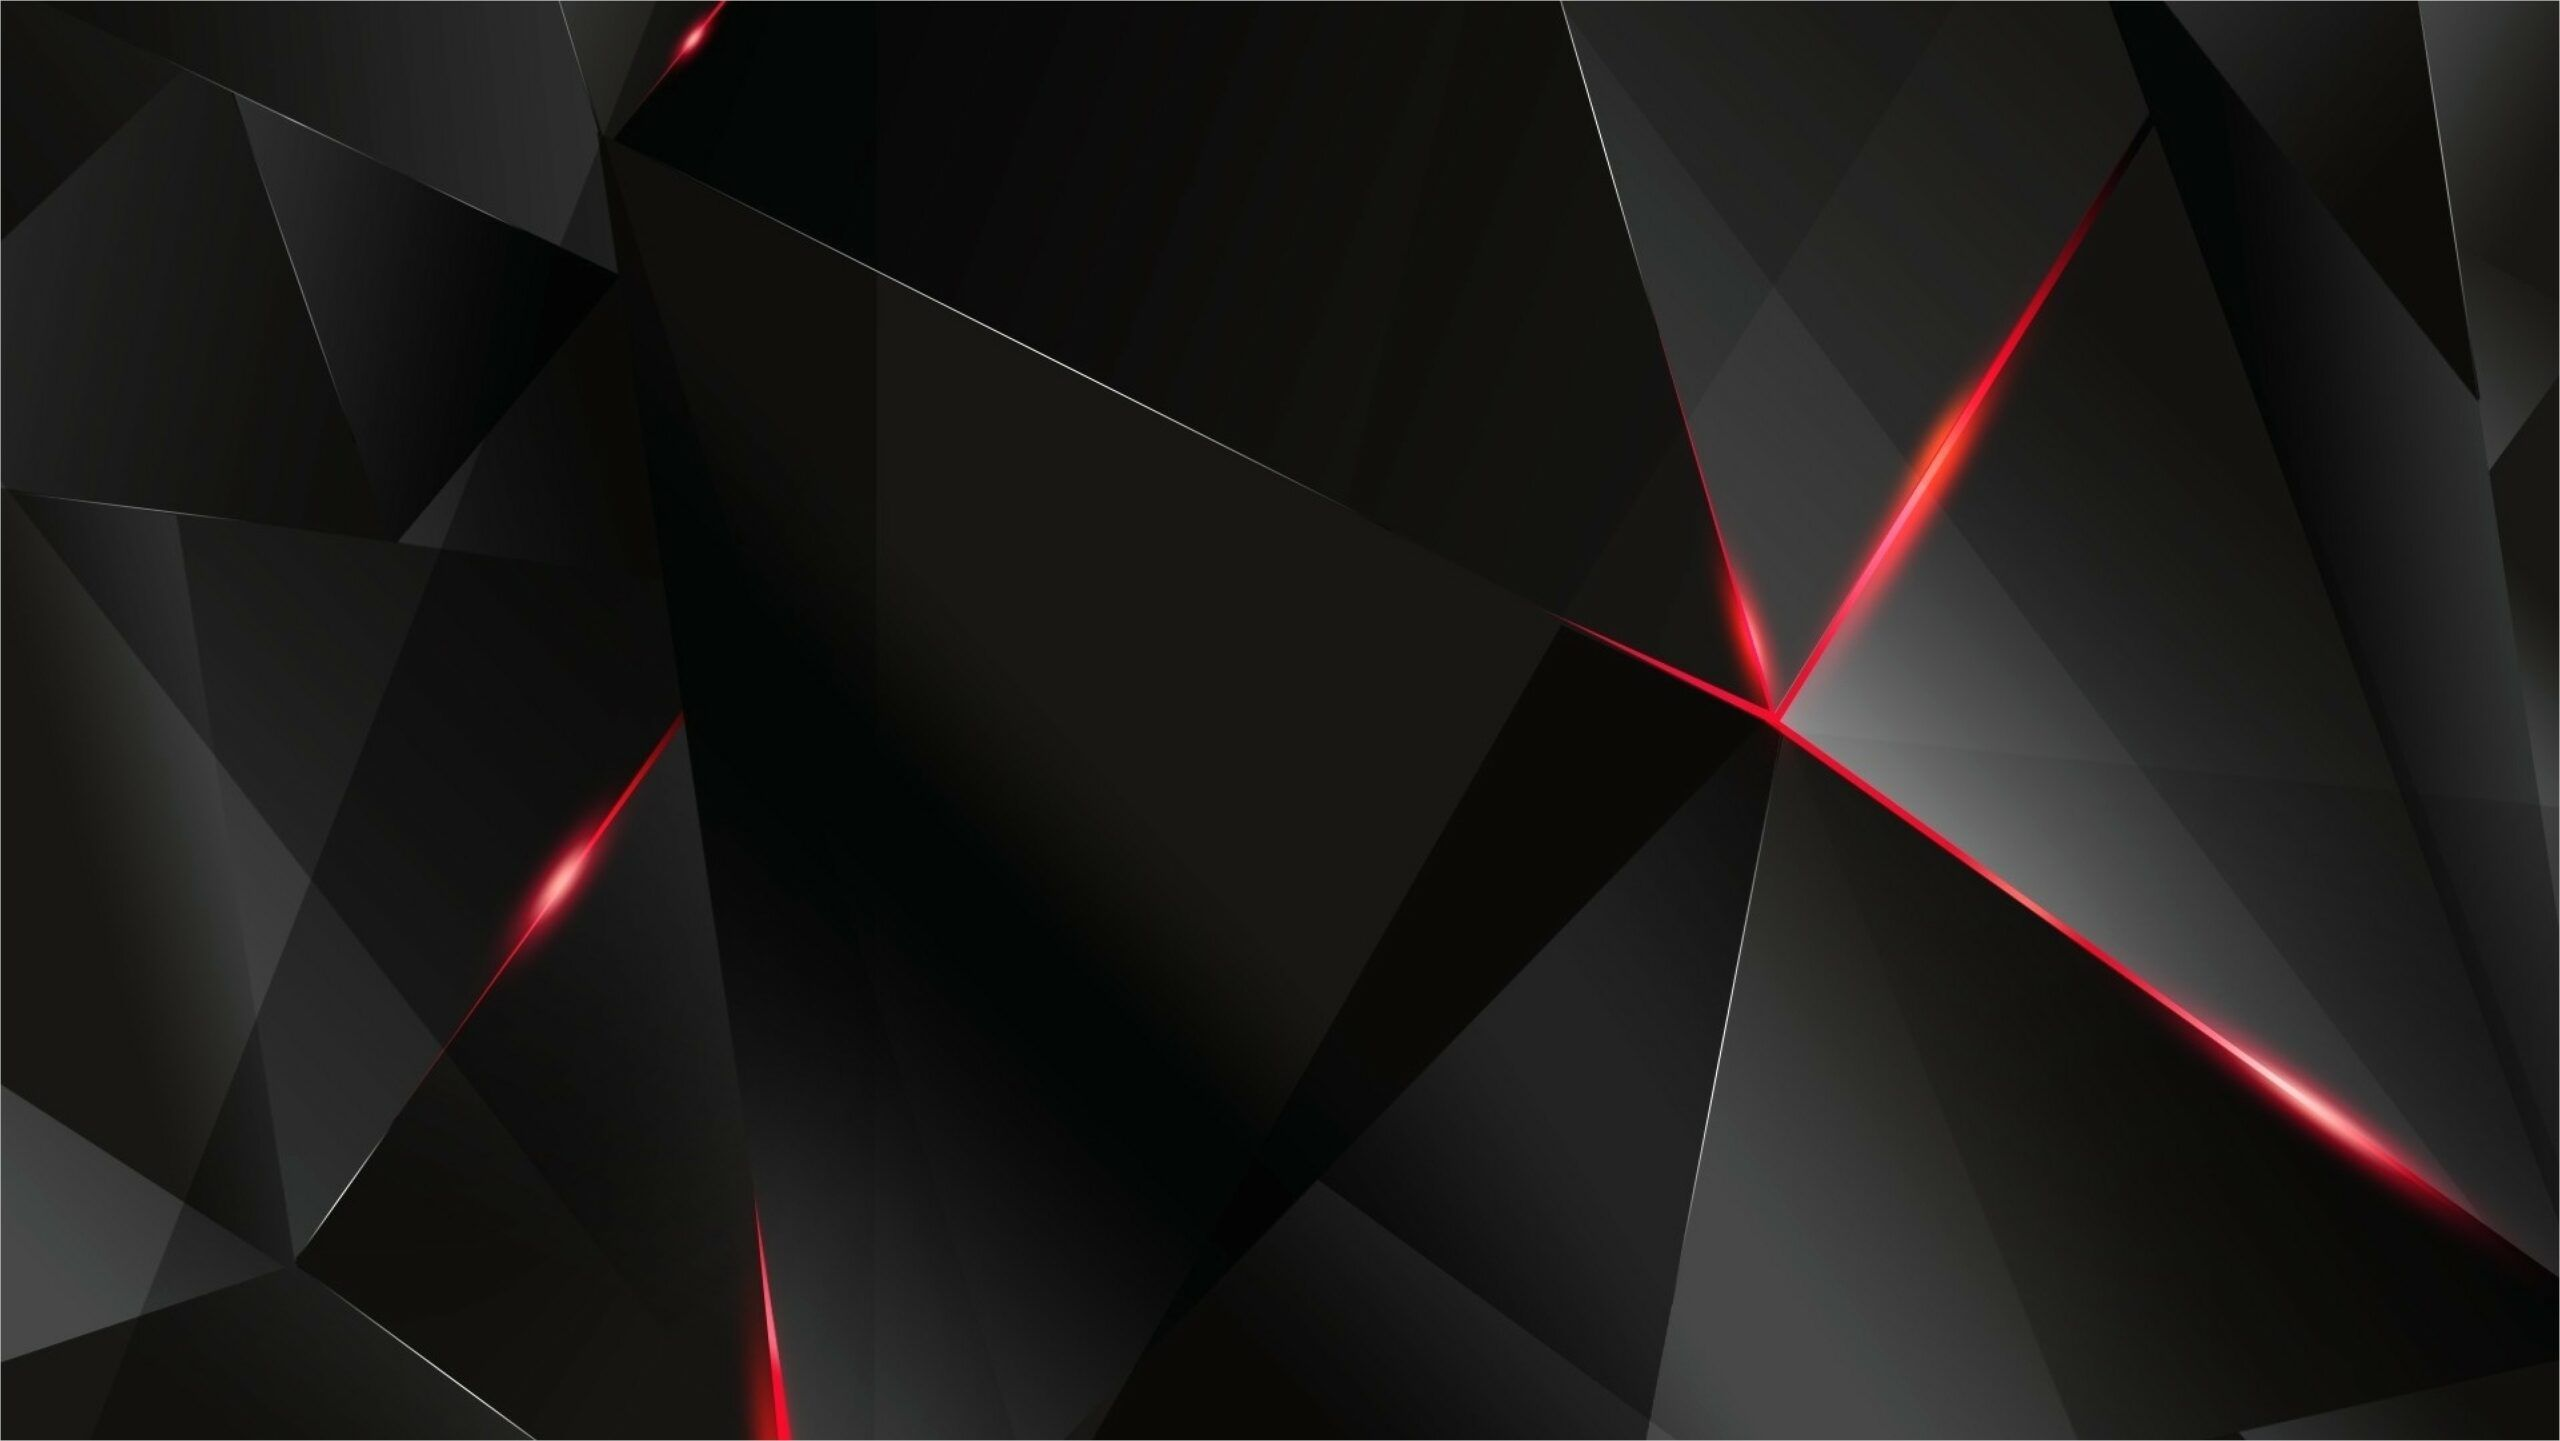 Red And Black 4k Wallpaper In 2020 Black Wallpaper High Resolution Wallpapers Dark Wallpaper